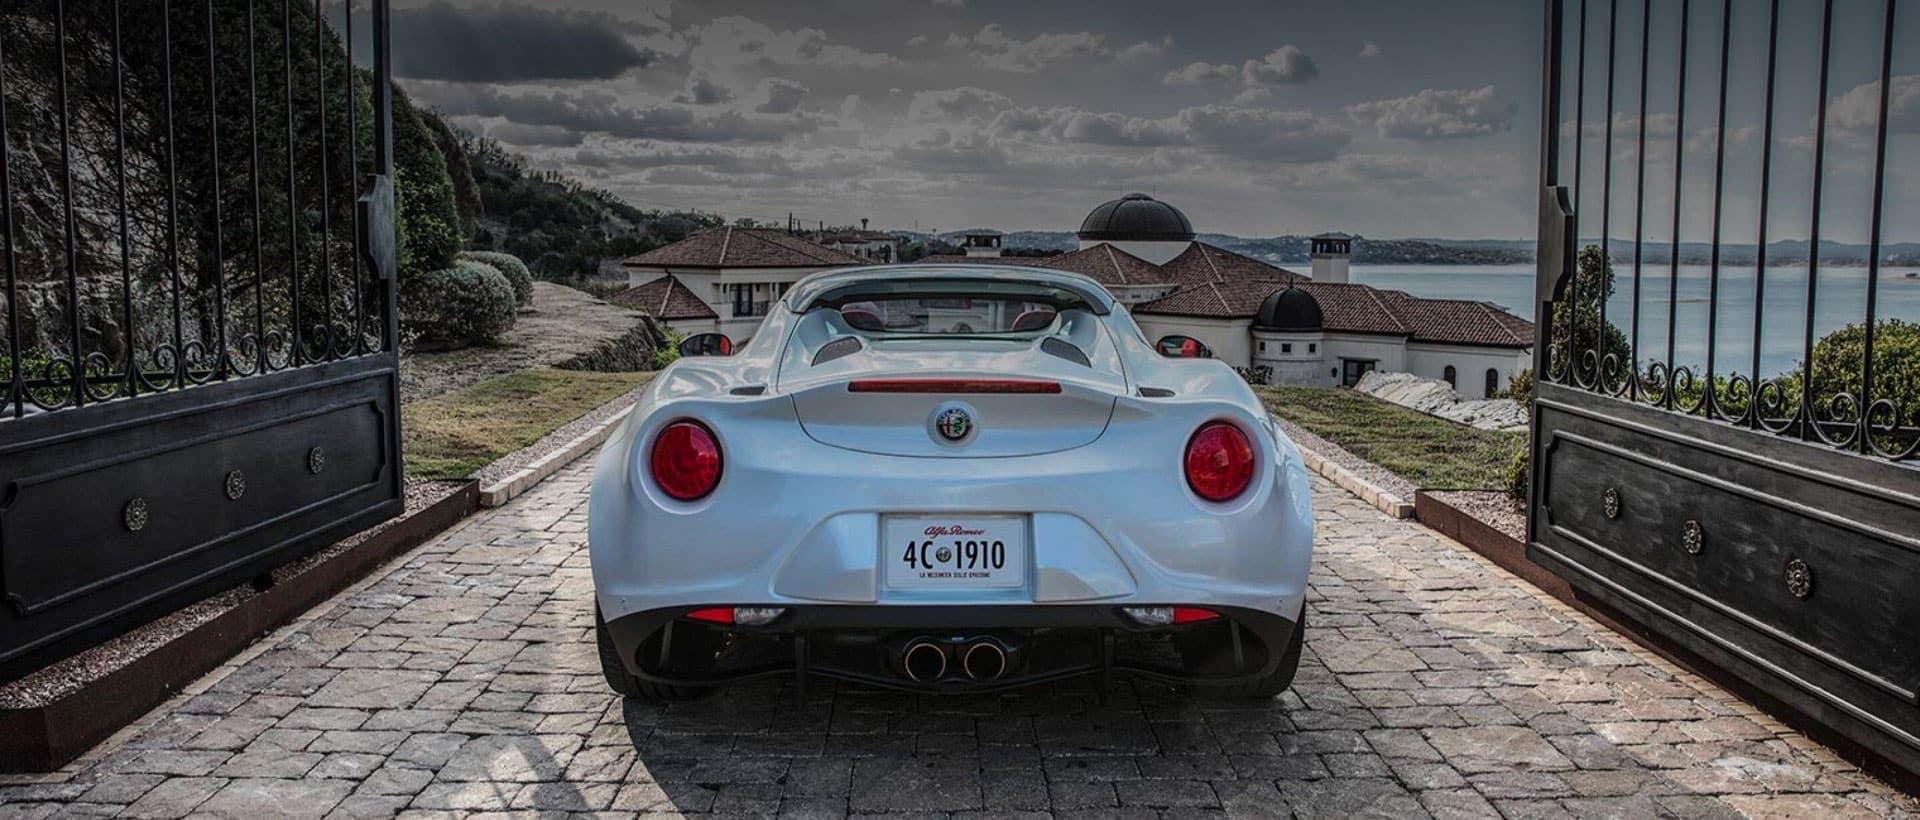 White Alfa Romeo driving out the gates into a seaside neighborhood